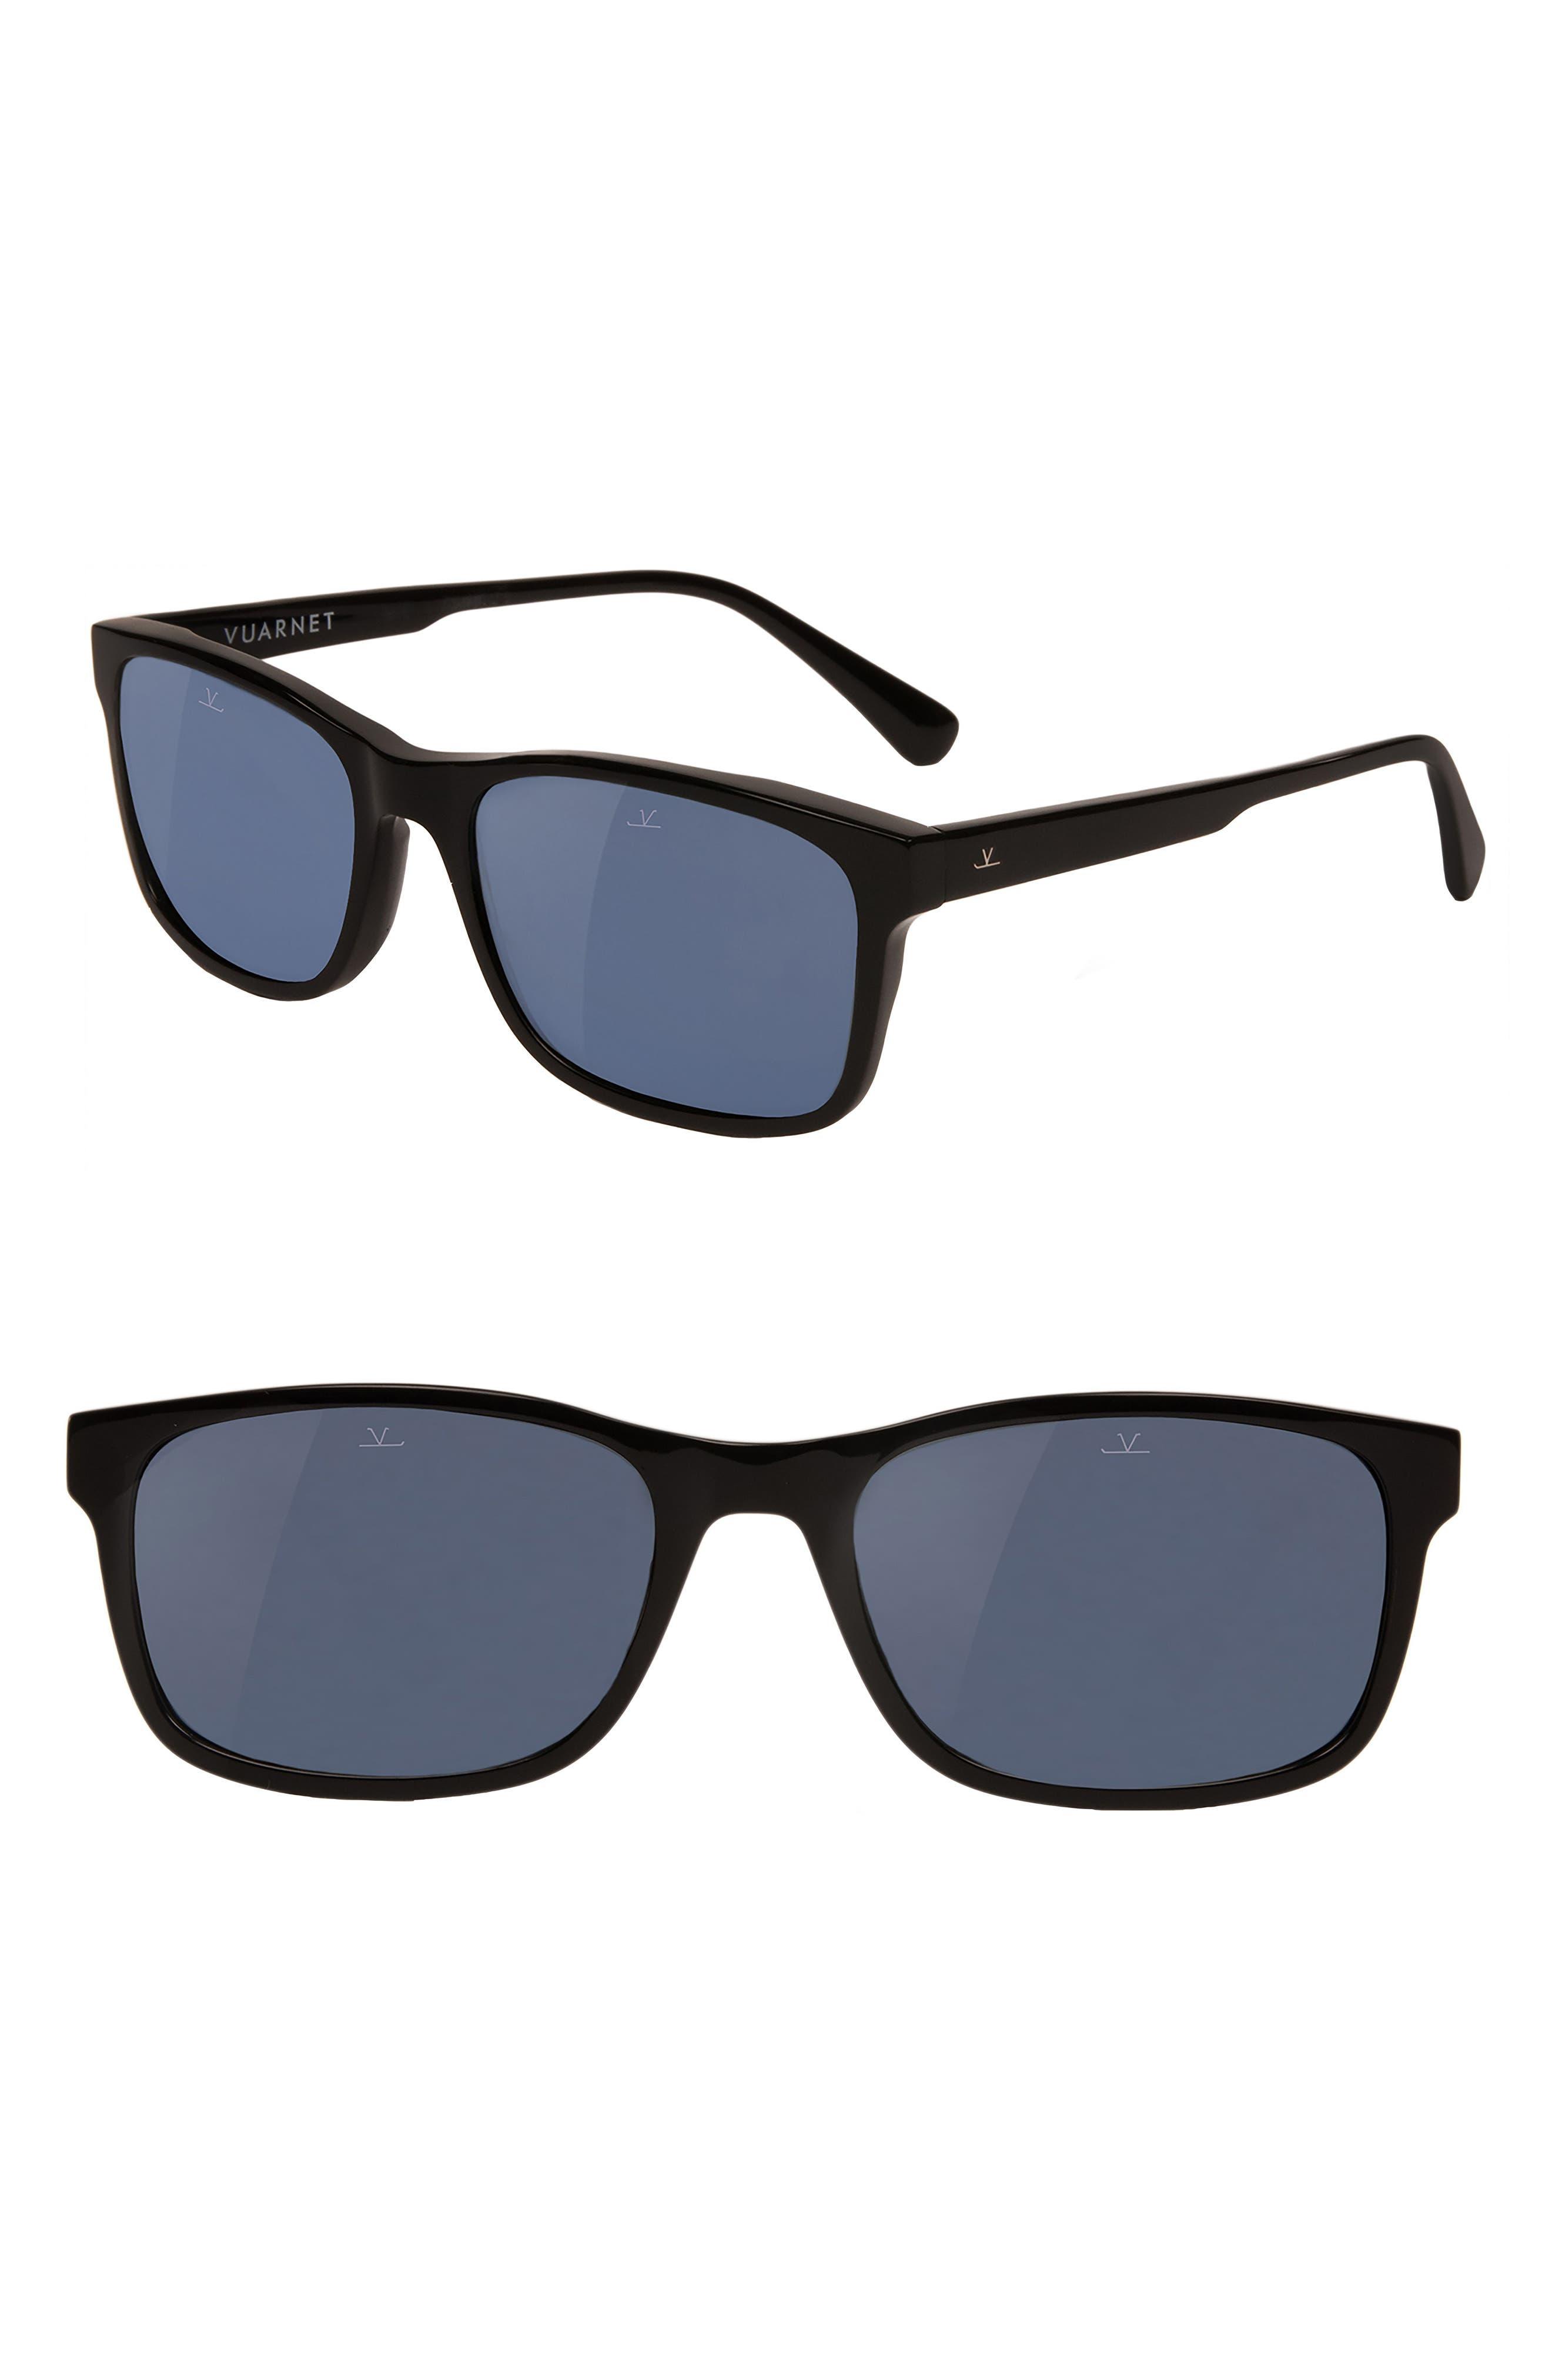 District Medium 55mm Polarized Sunglasses,                             Main thumbnail 1, color,                             Blue Polar